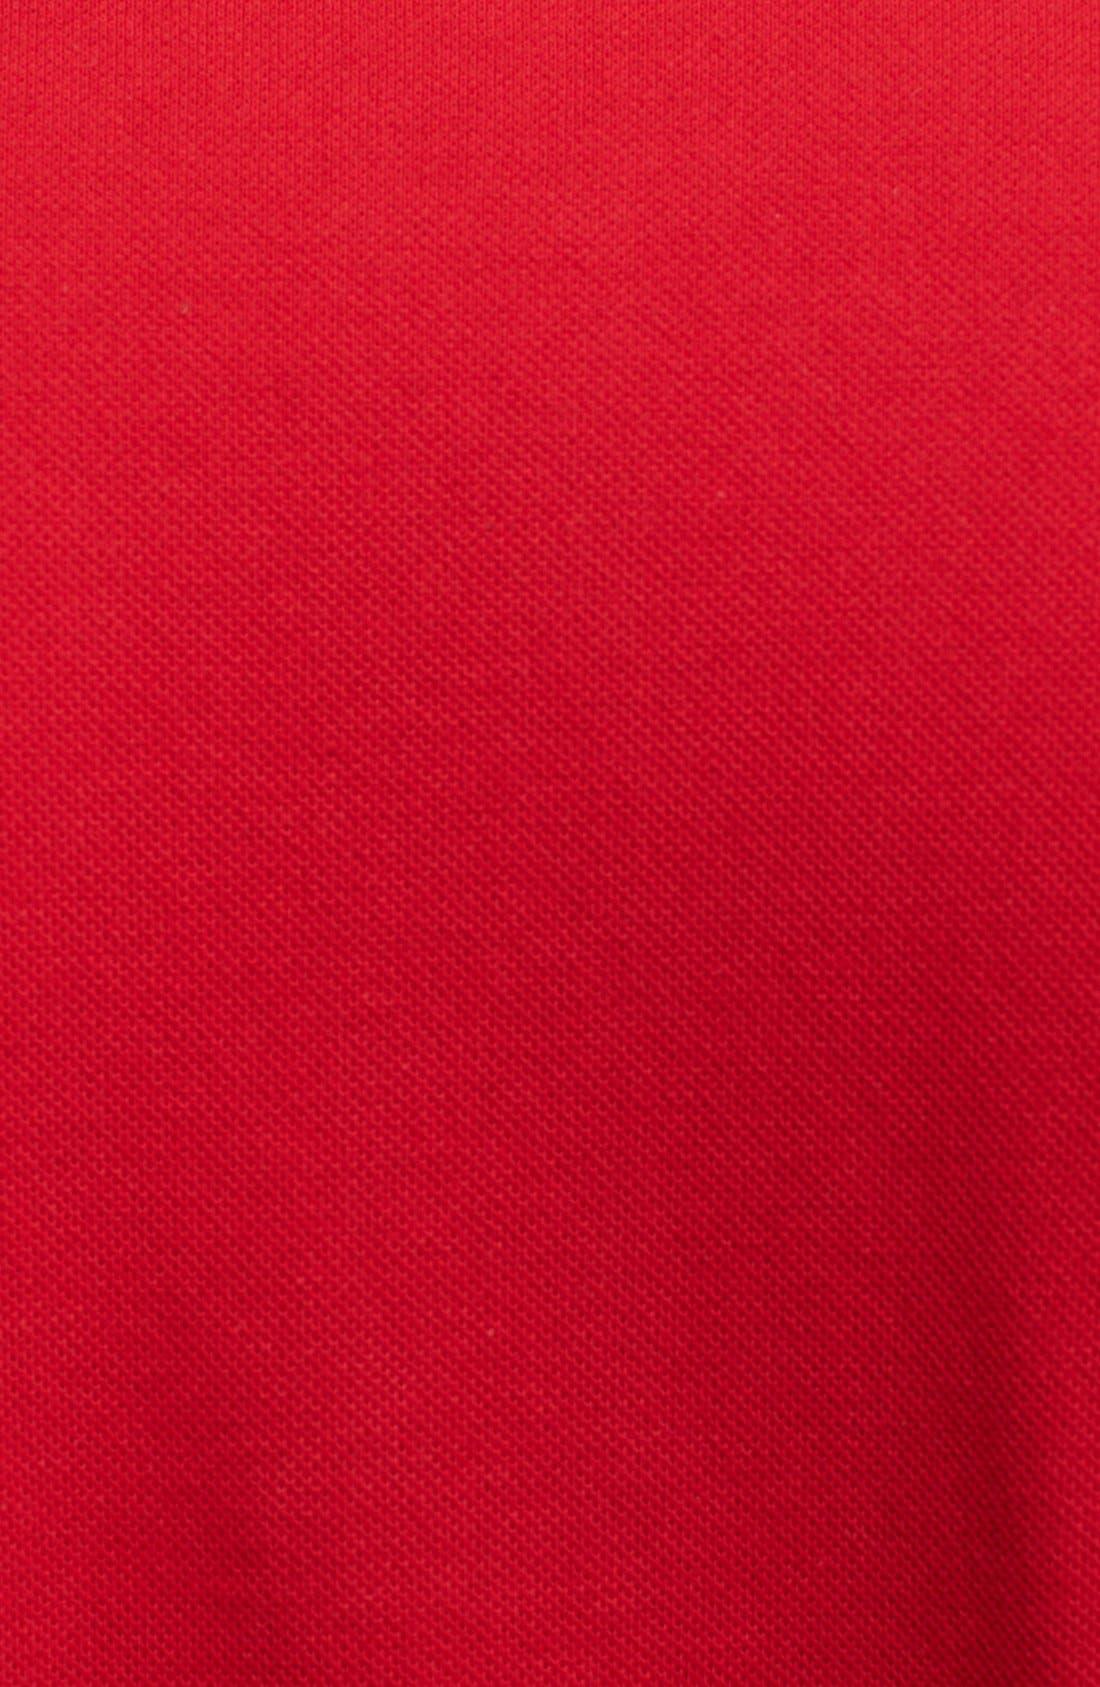 Comme des Garçons PLAY Piqué Polo with Heart Appliqué,                             Alternate thumbnail 3, color,                             Red